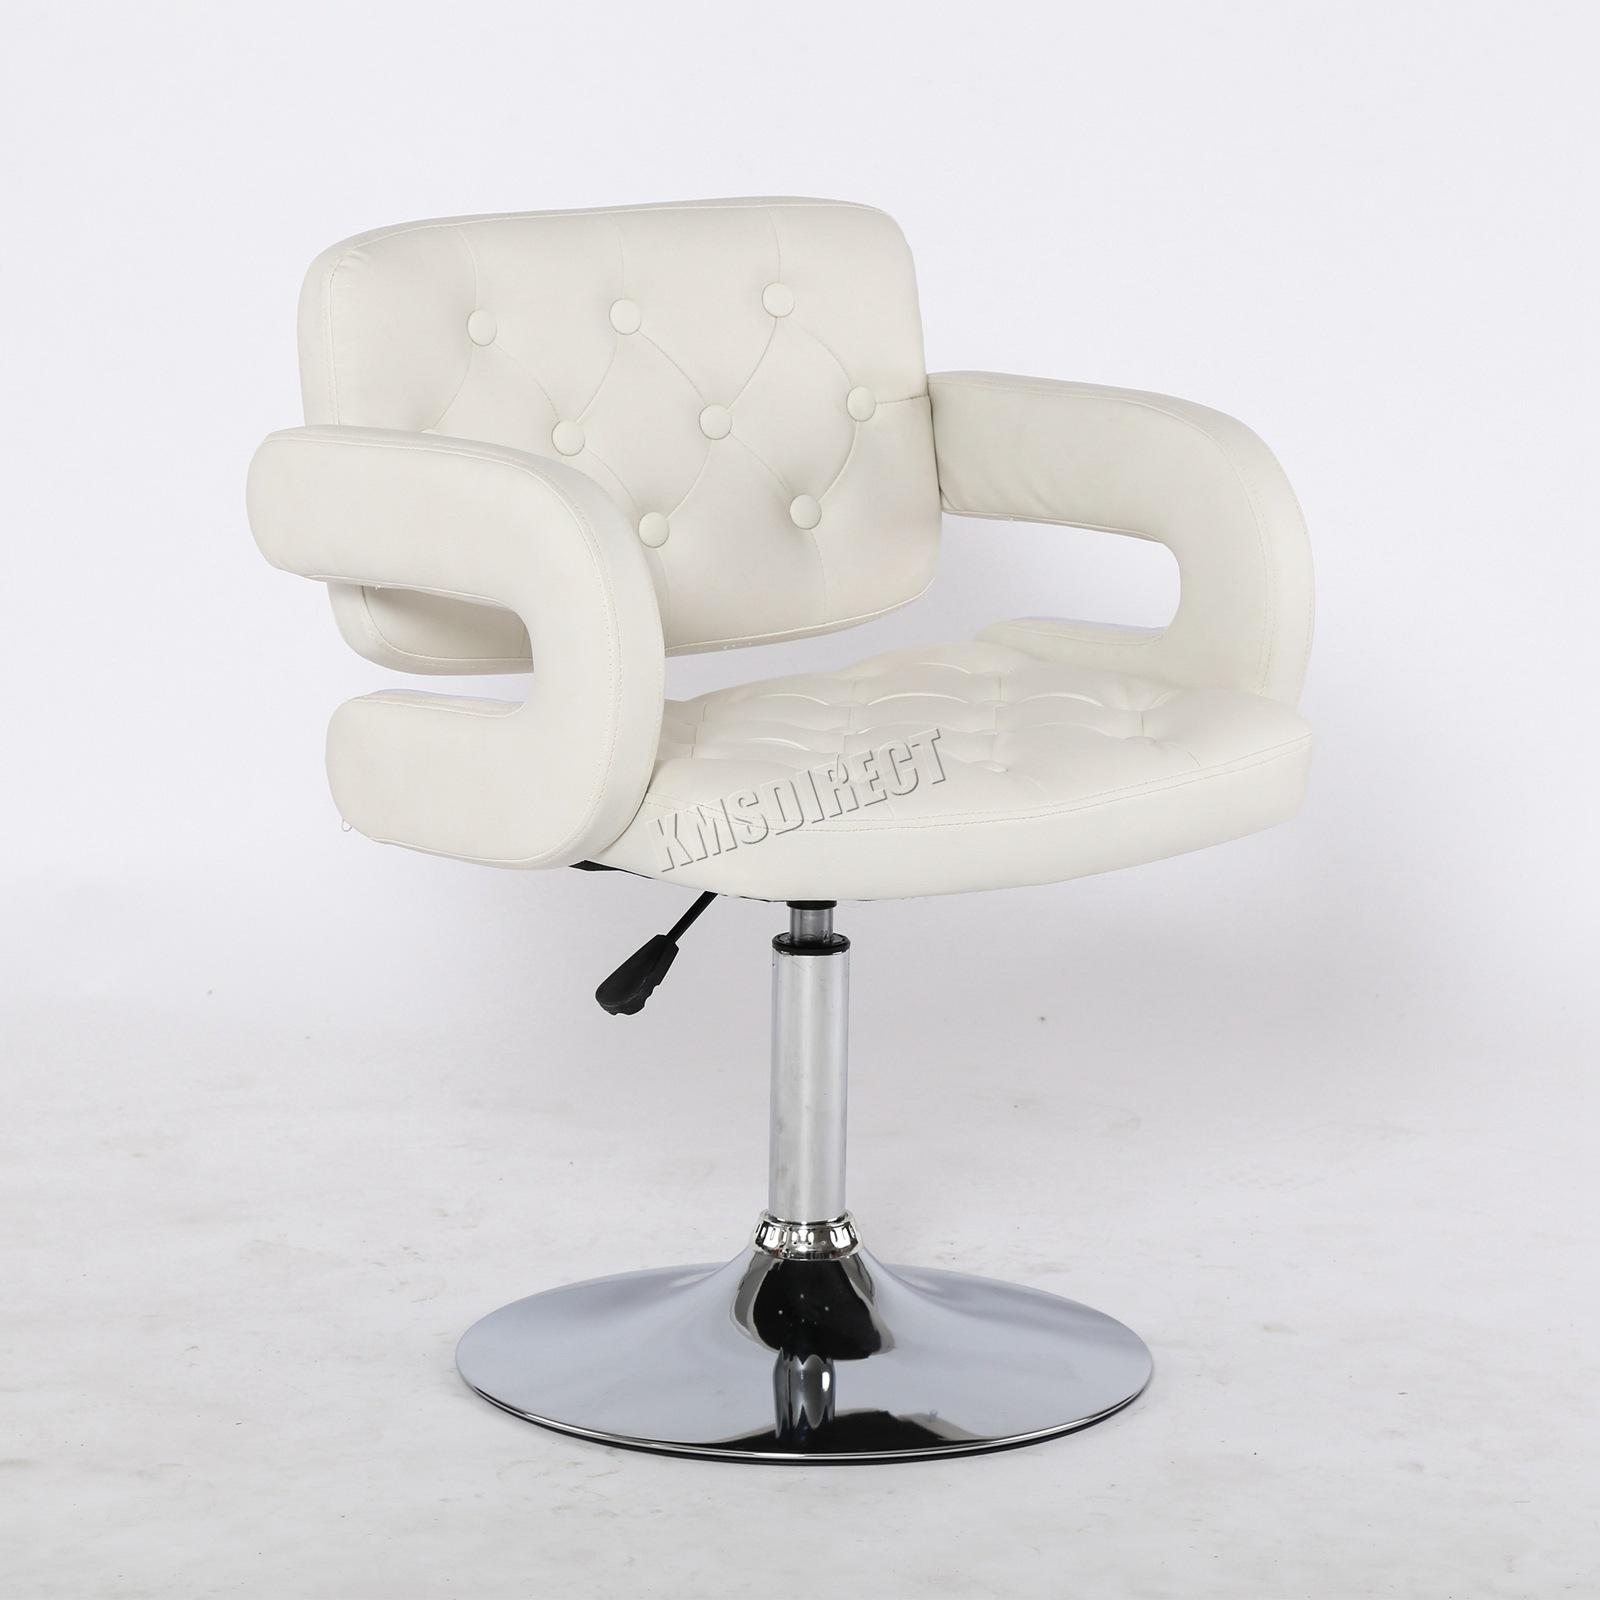 WestWood-Beauty-Salon-Chair-Barber-Hairdressing-Hair-Cut-PU-Leather-Modern-SC02 miniatuur 24